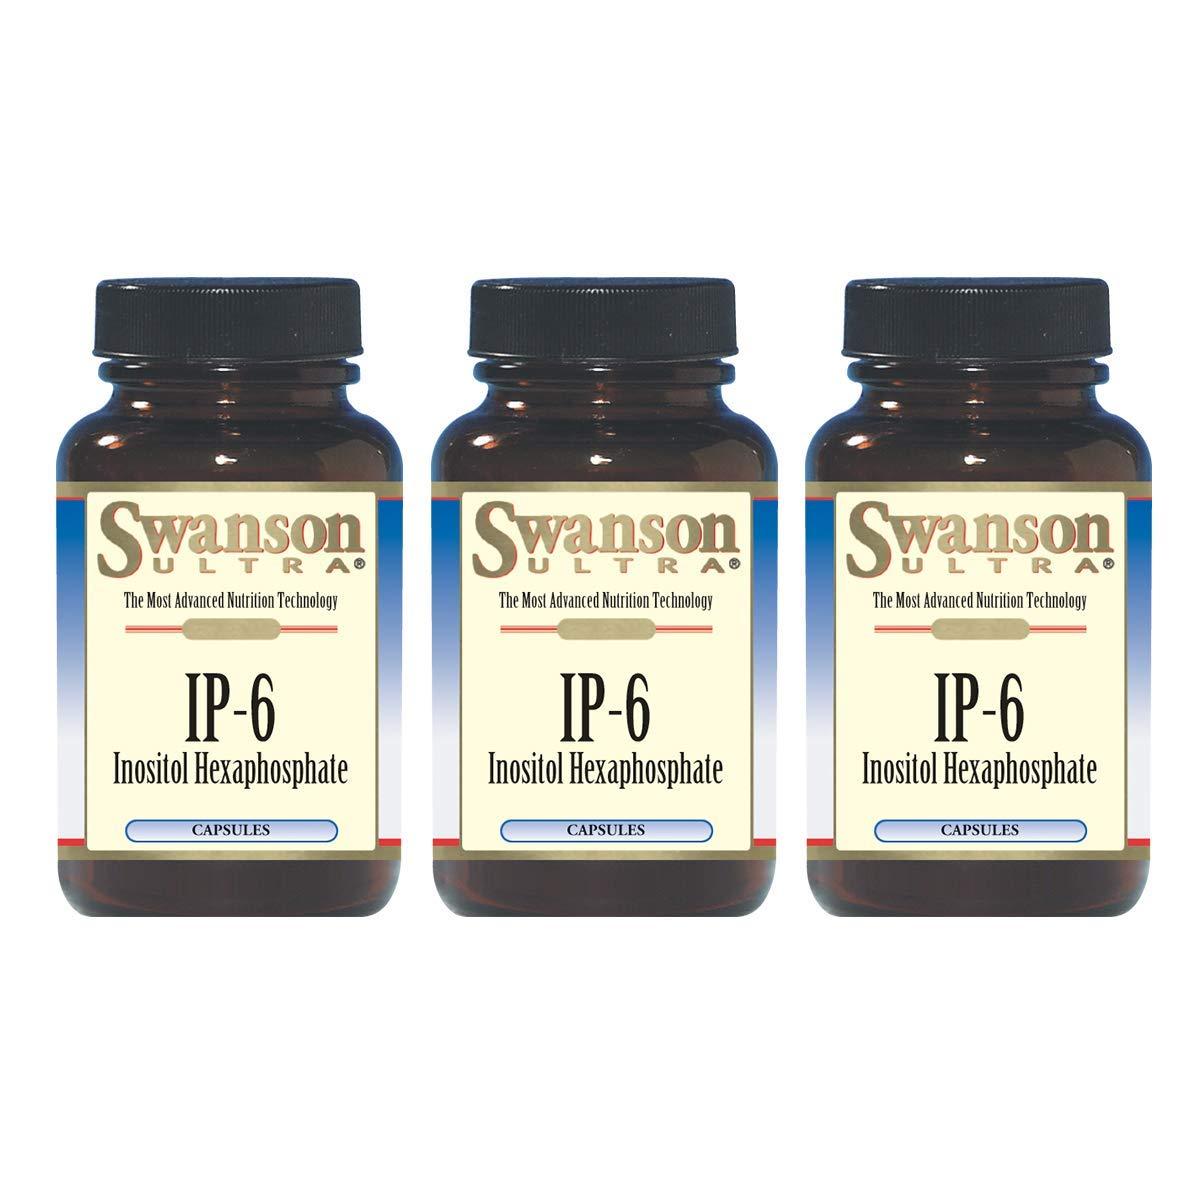 Swanson IP-6 Inositol Hexaphosphate 240 Capsules (3 Pack)